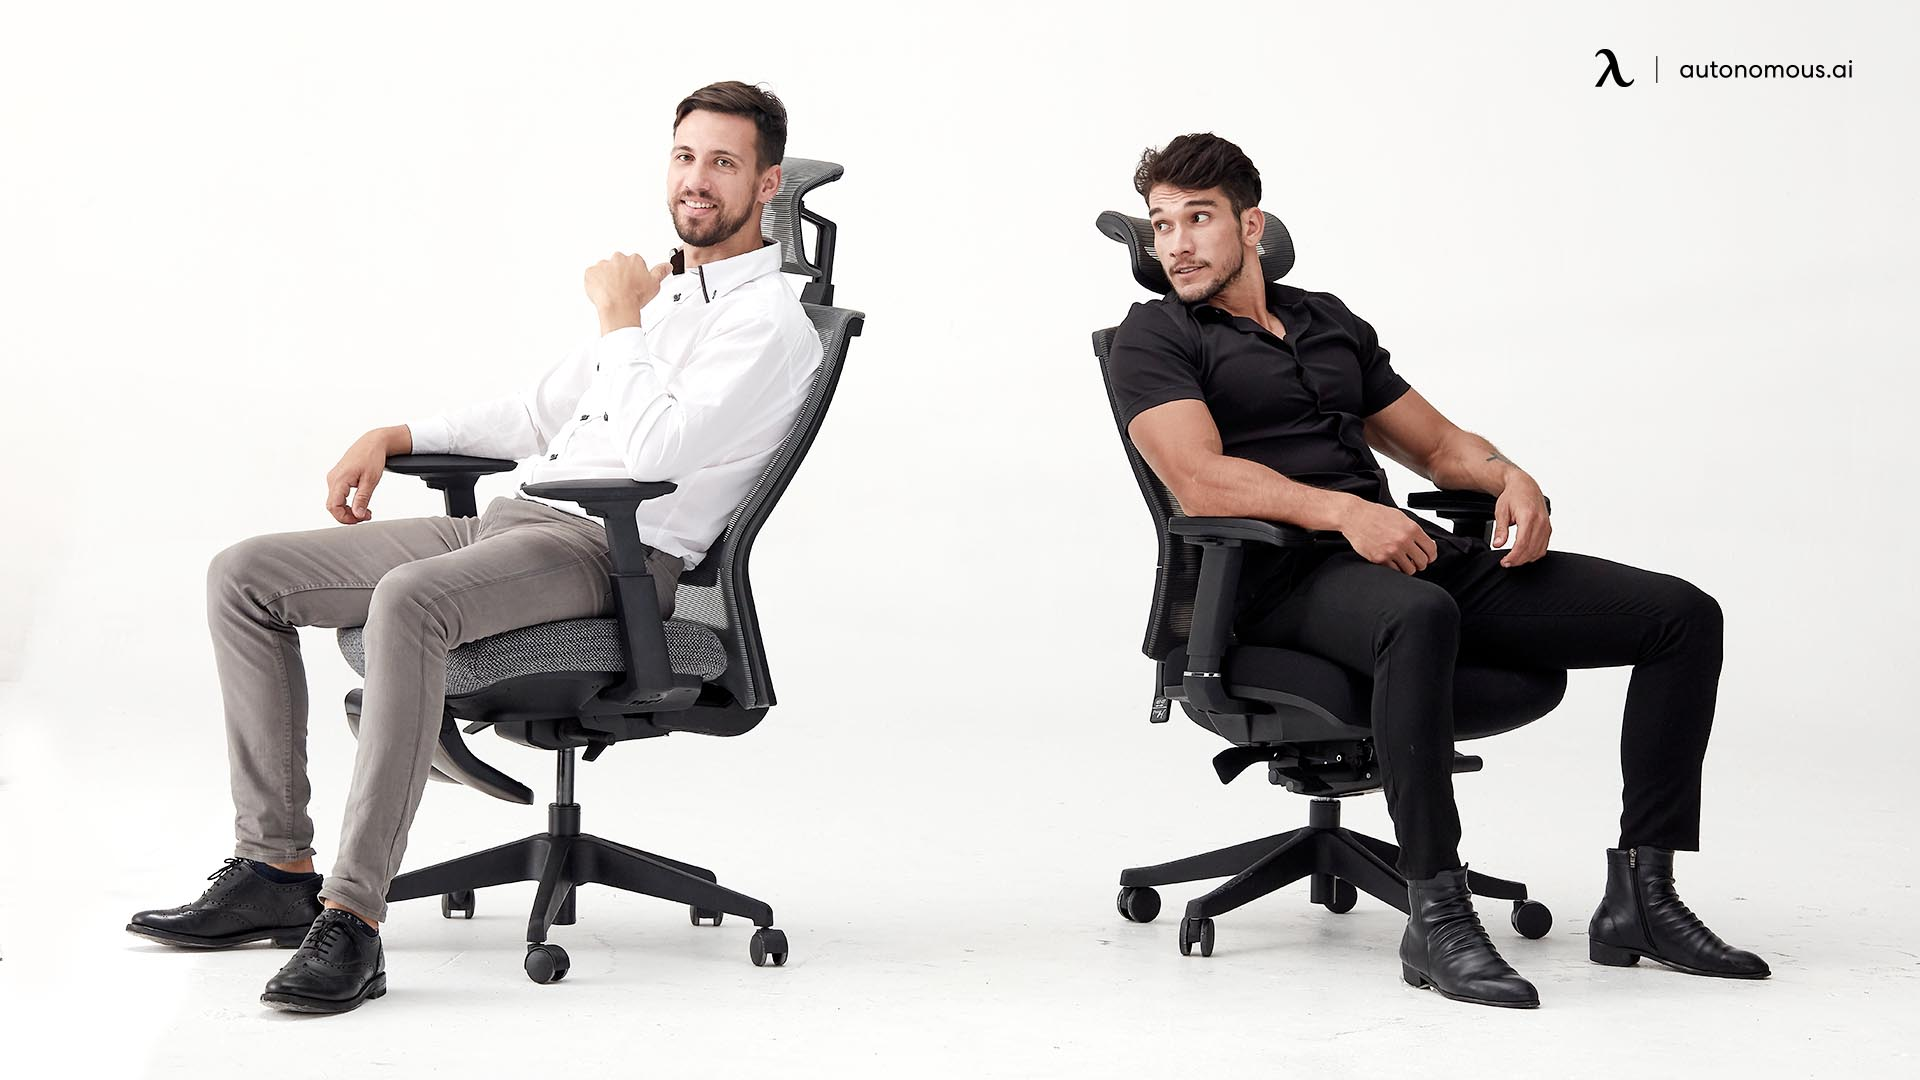 Ergonomic Chairs Definition